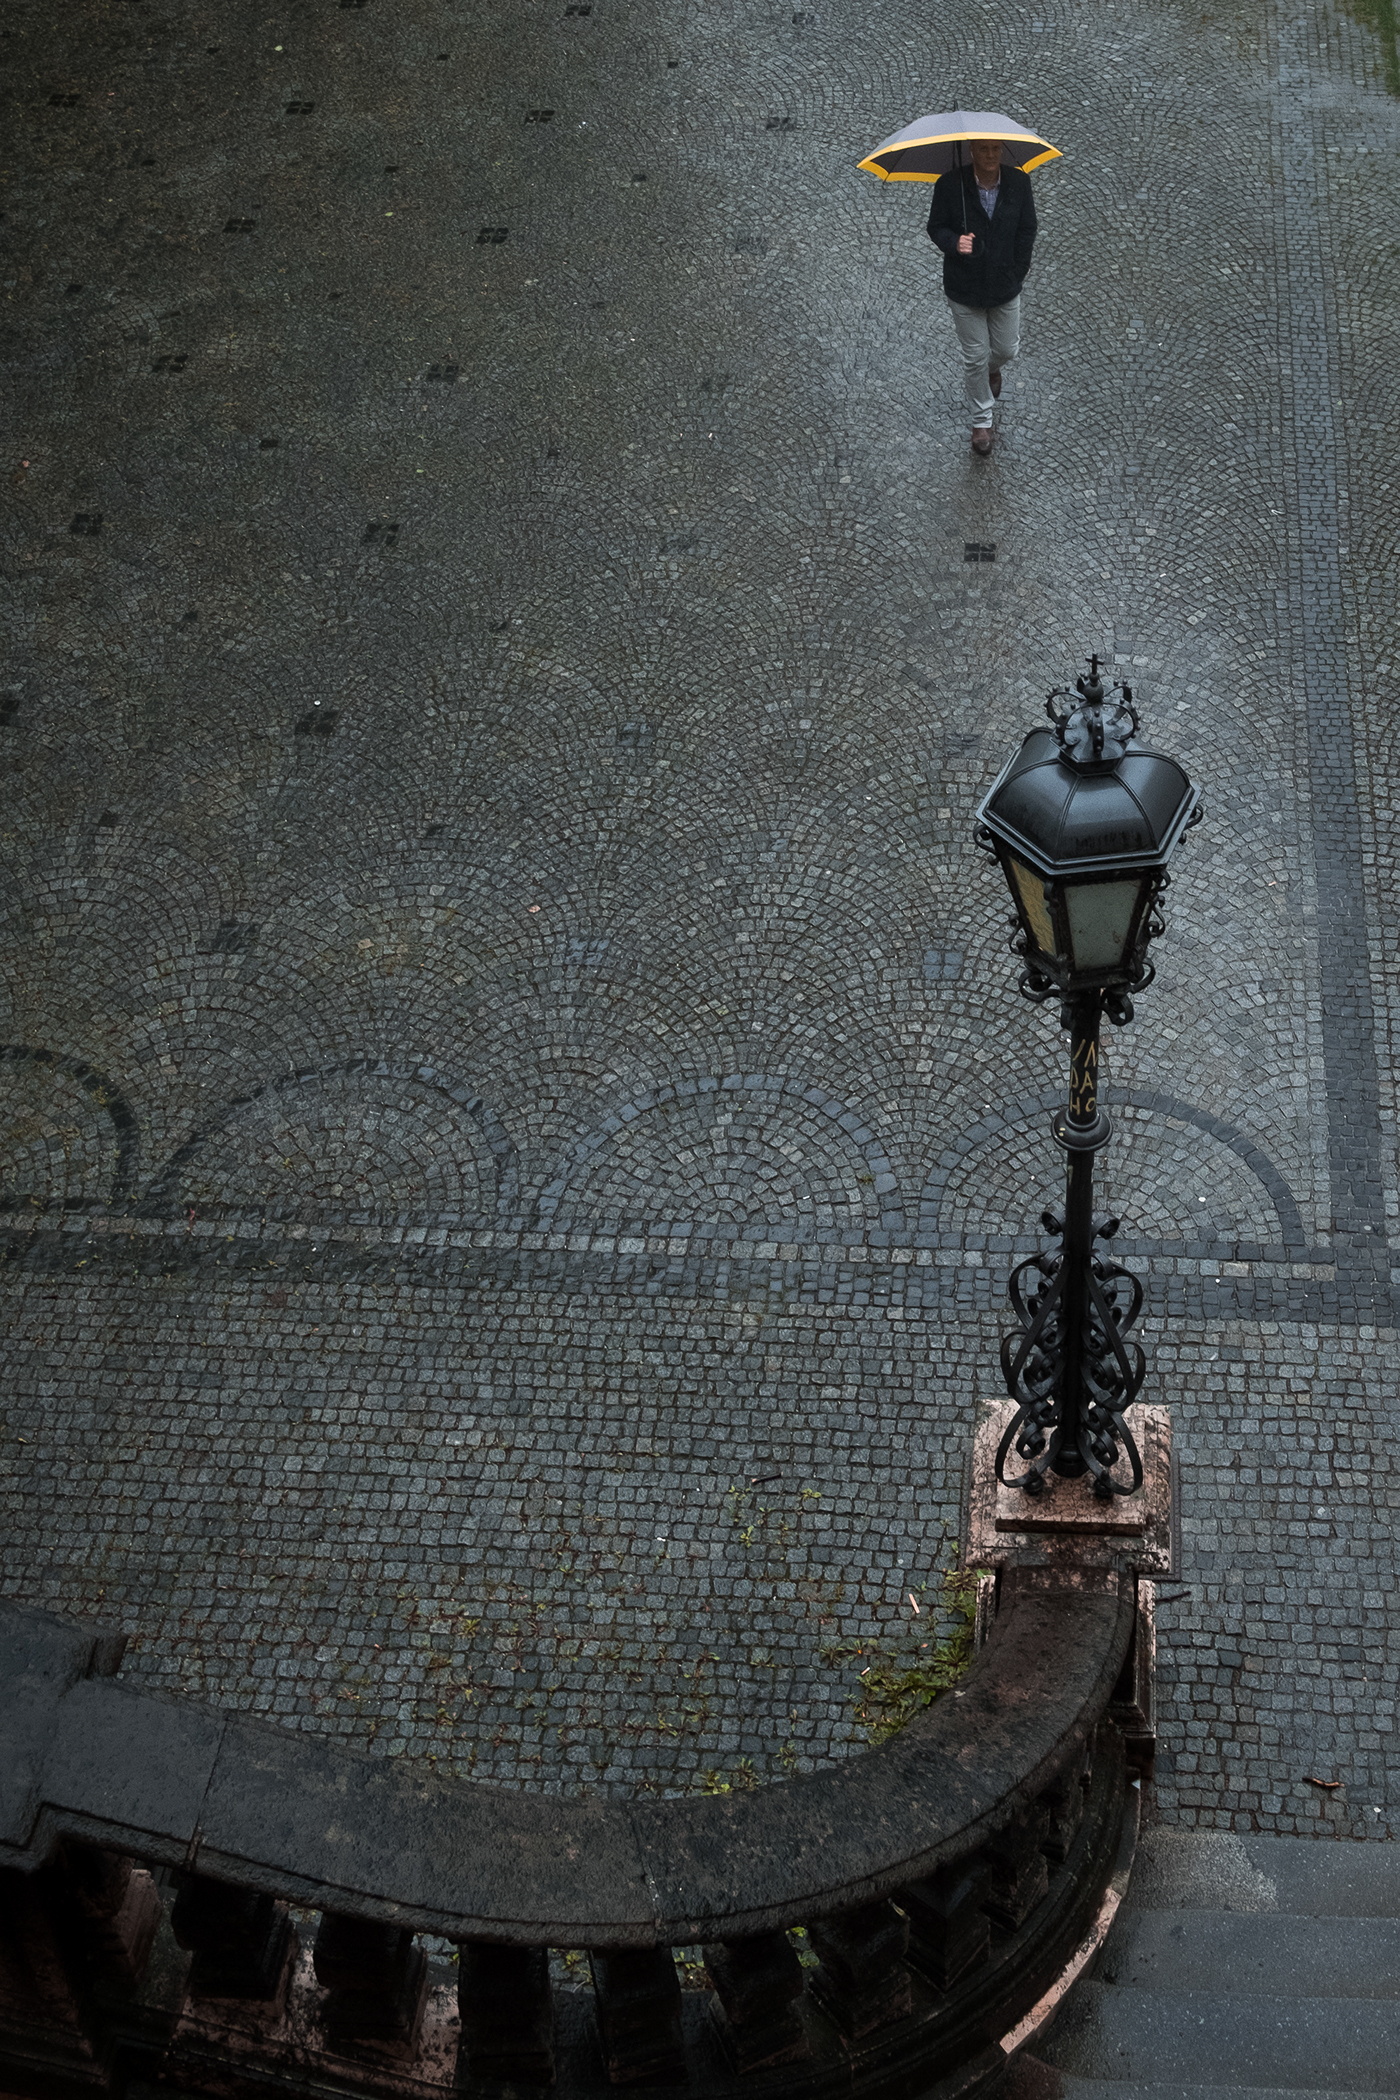 Дождь в Мюнхене / Фотограф Skander Khlif